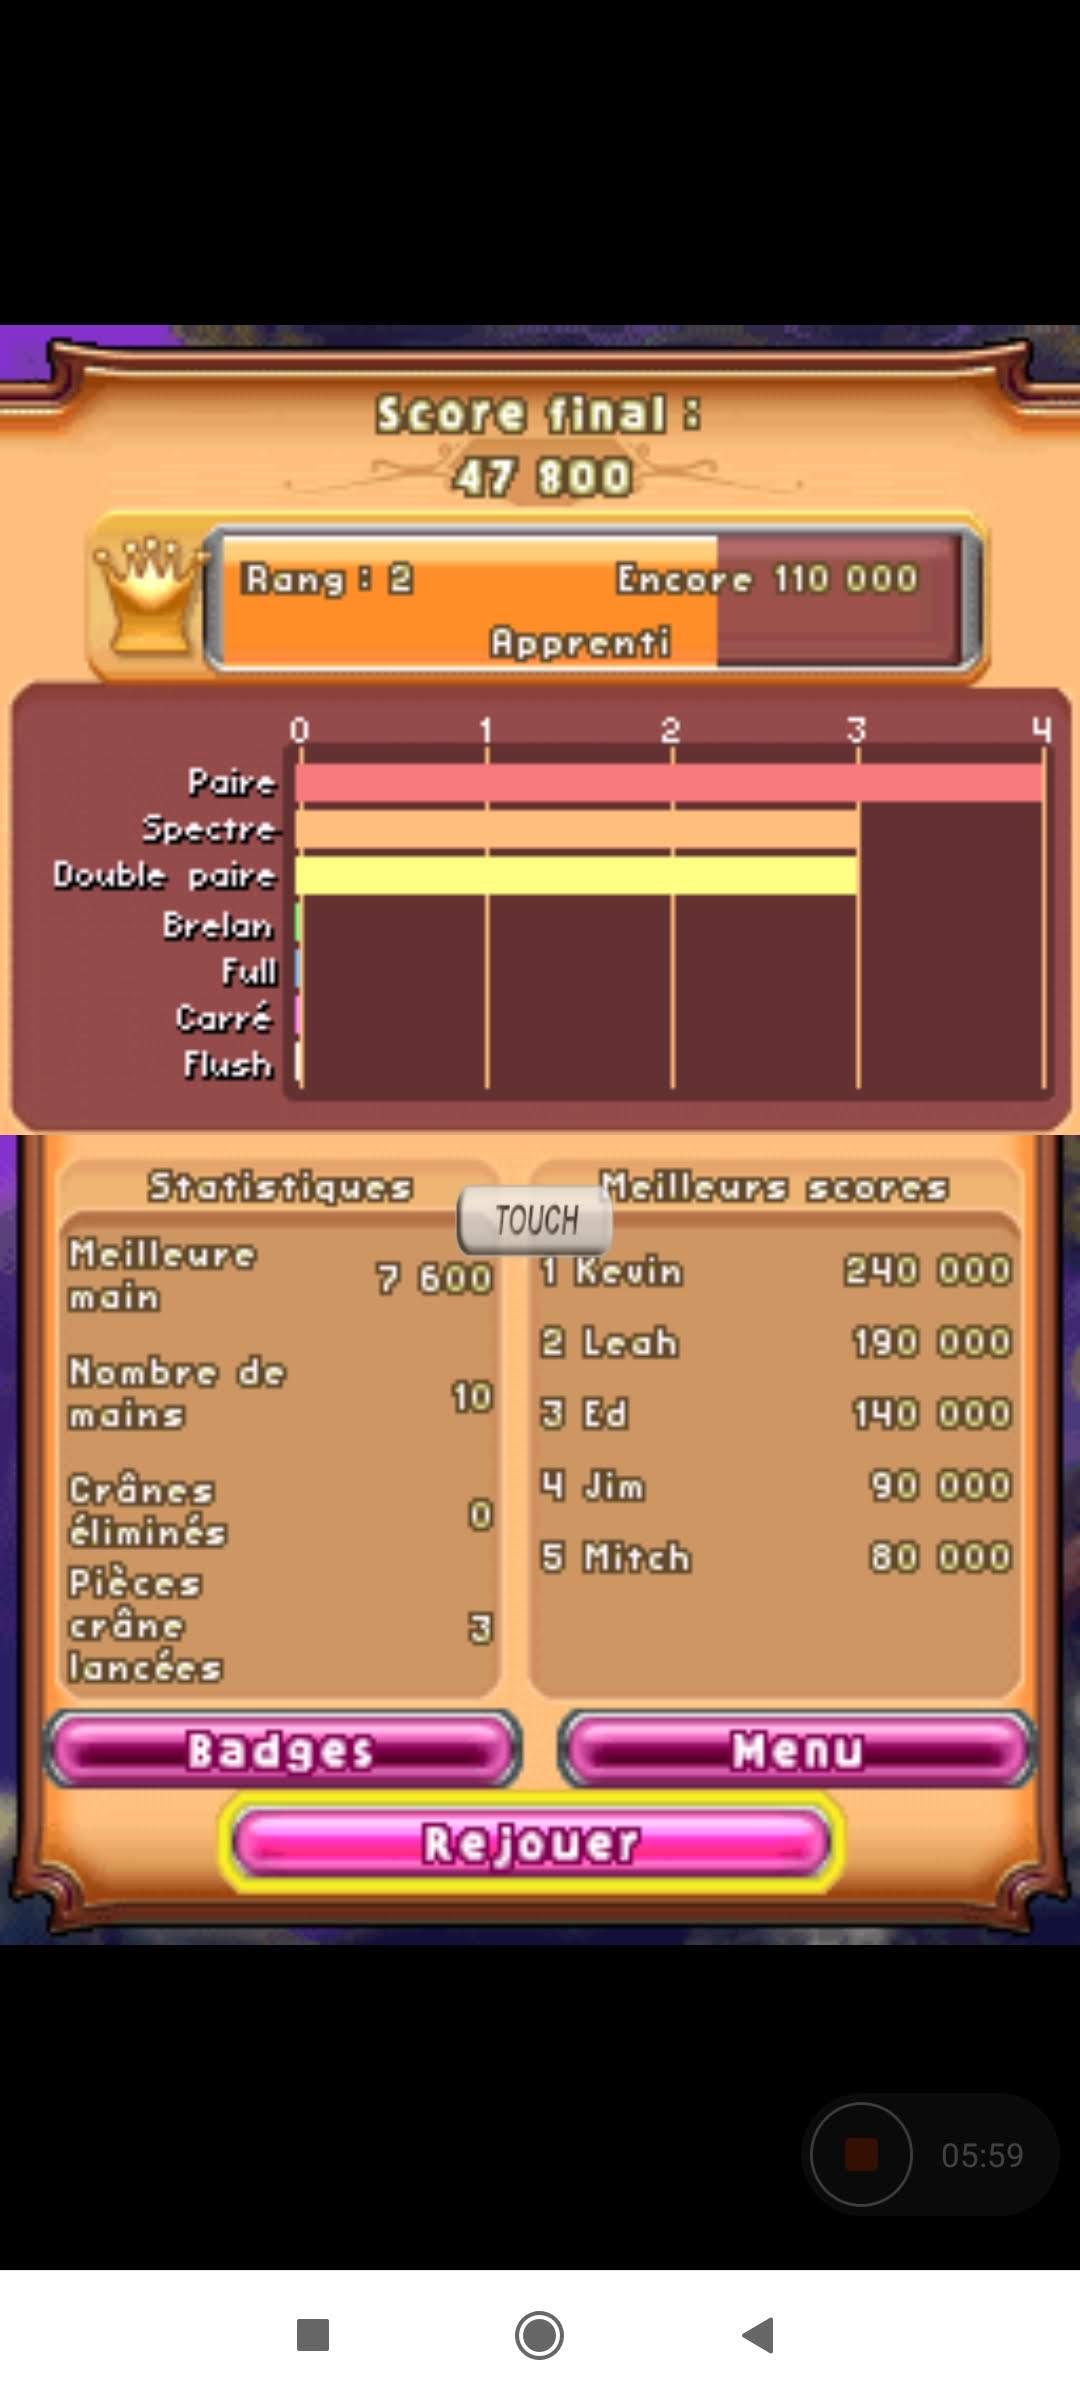 Larquey: Bejeweled 3: Poker [Skulls Busted] (Nintendo DS Emulated) 0 points on 2020-09-26 03:21:42